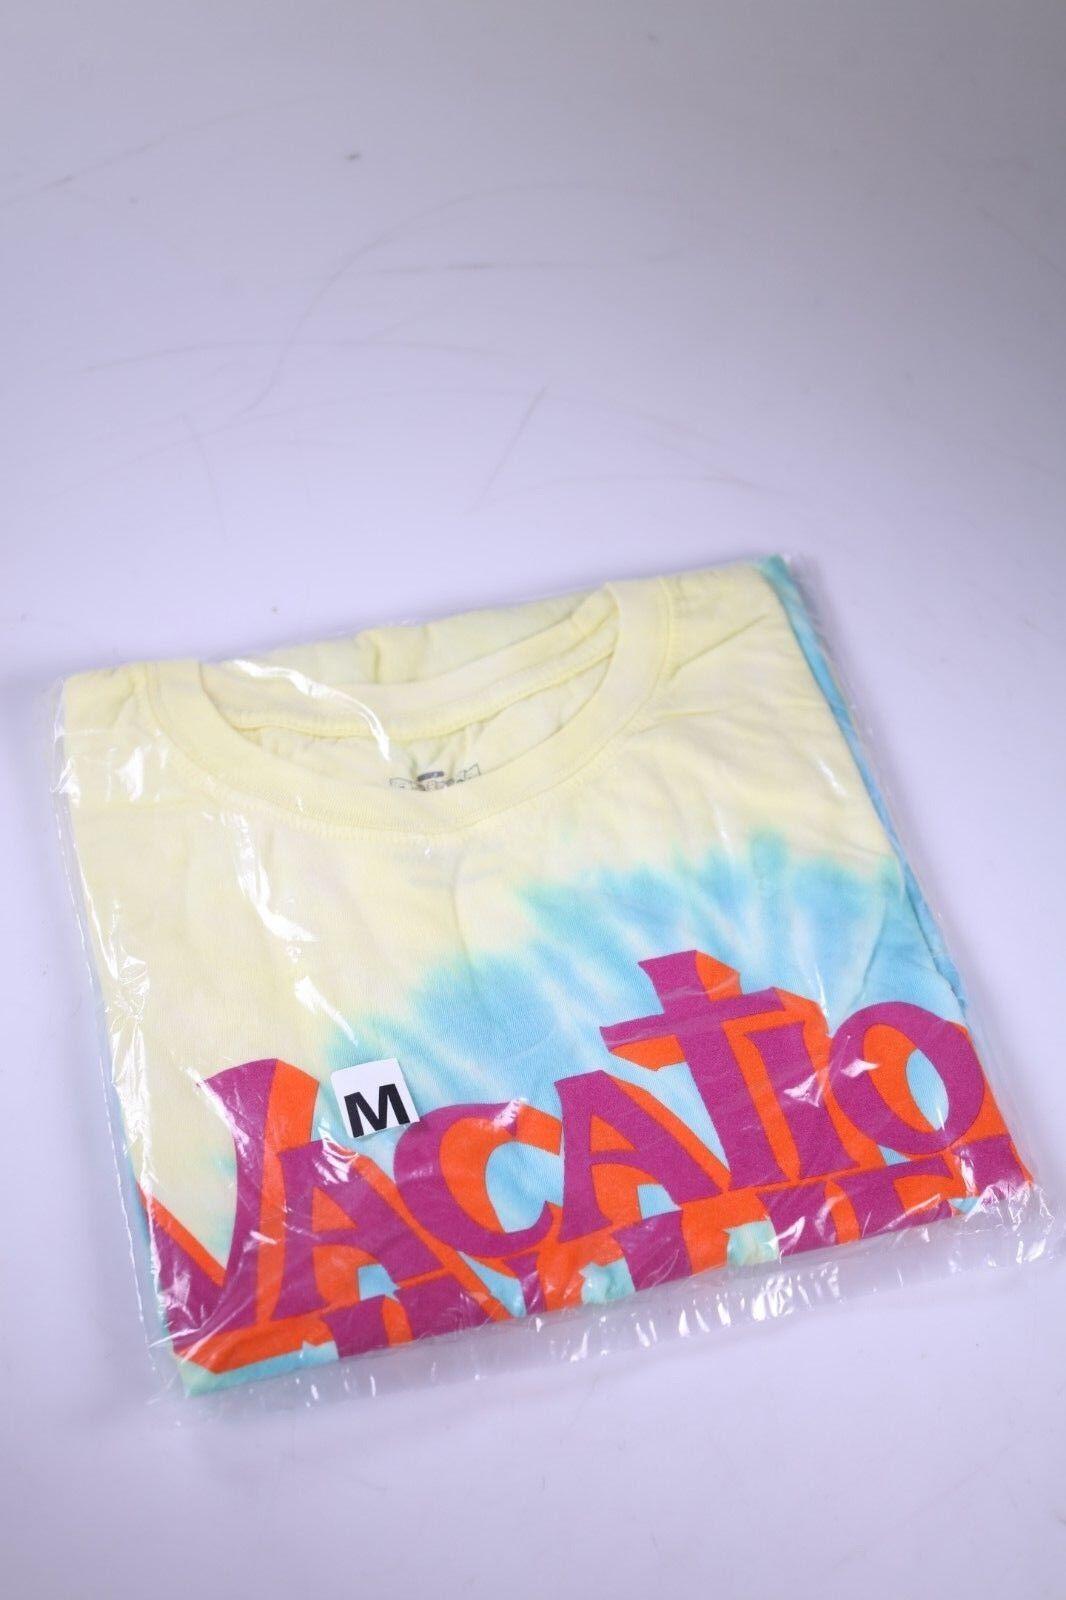 Flatbush Zombies ViH Tie Dye T Shirt Größe M New, Sealed